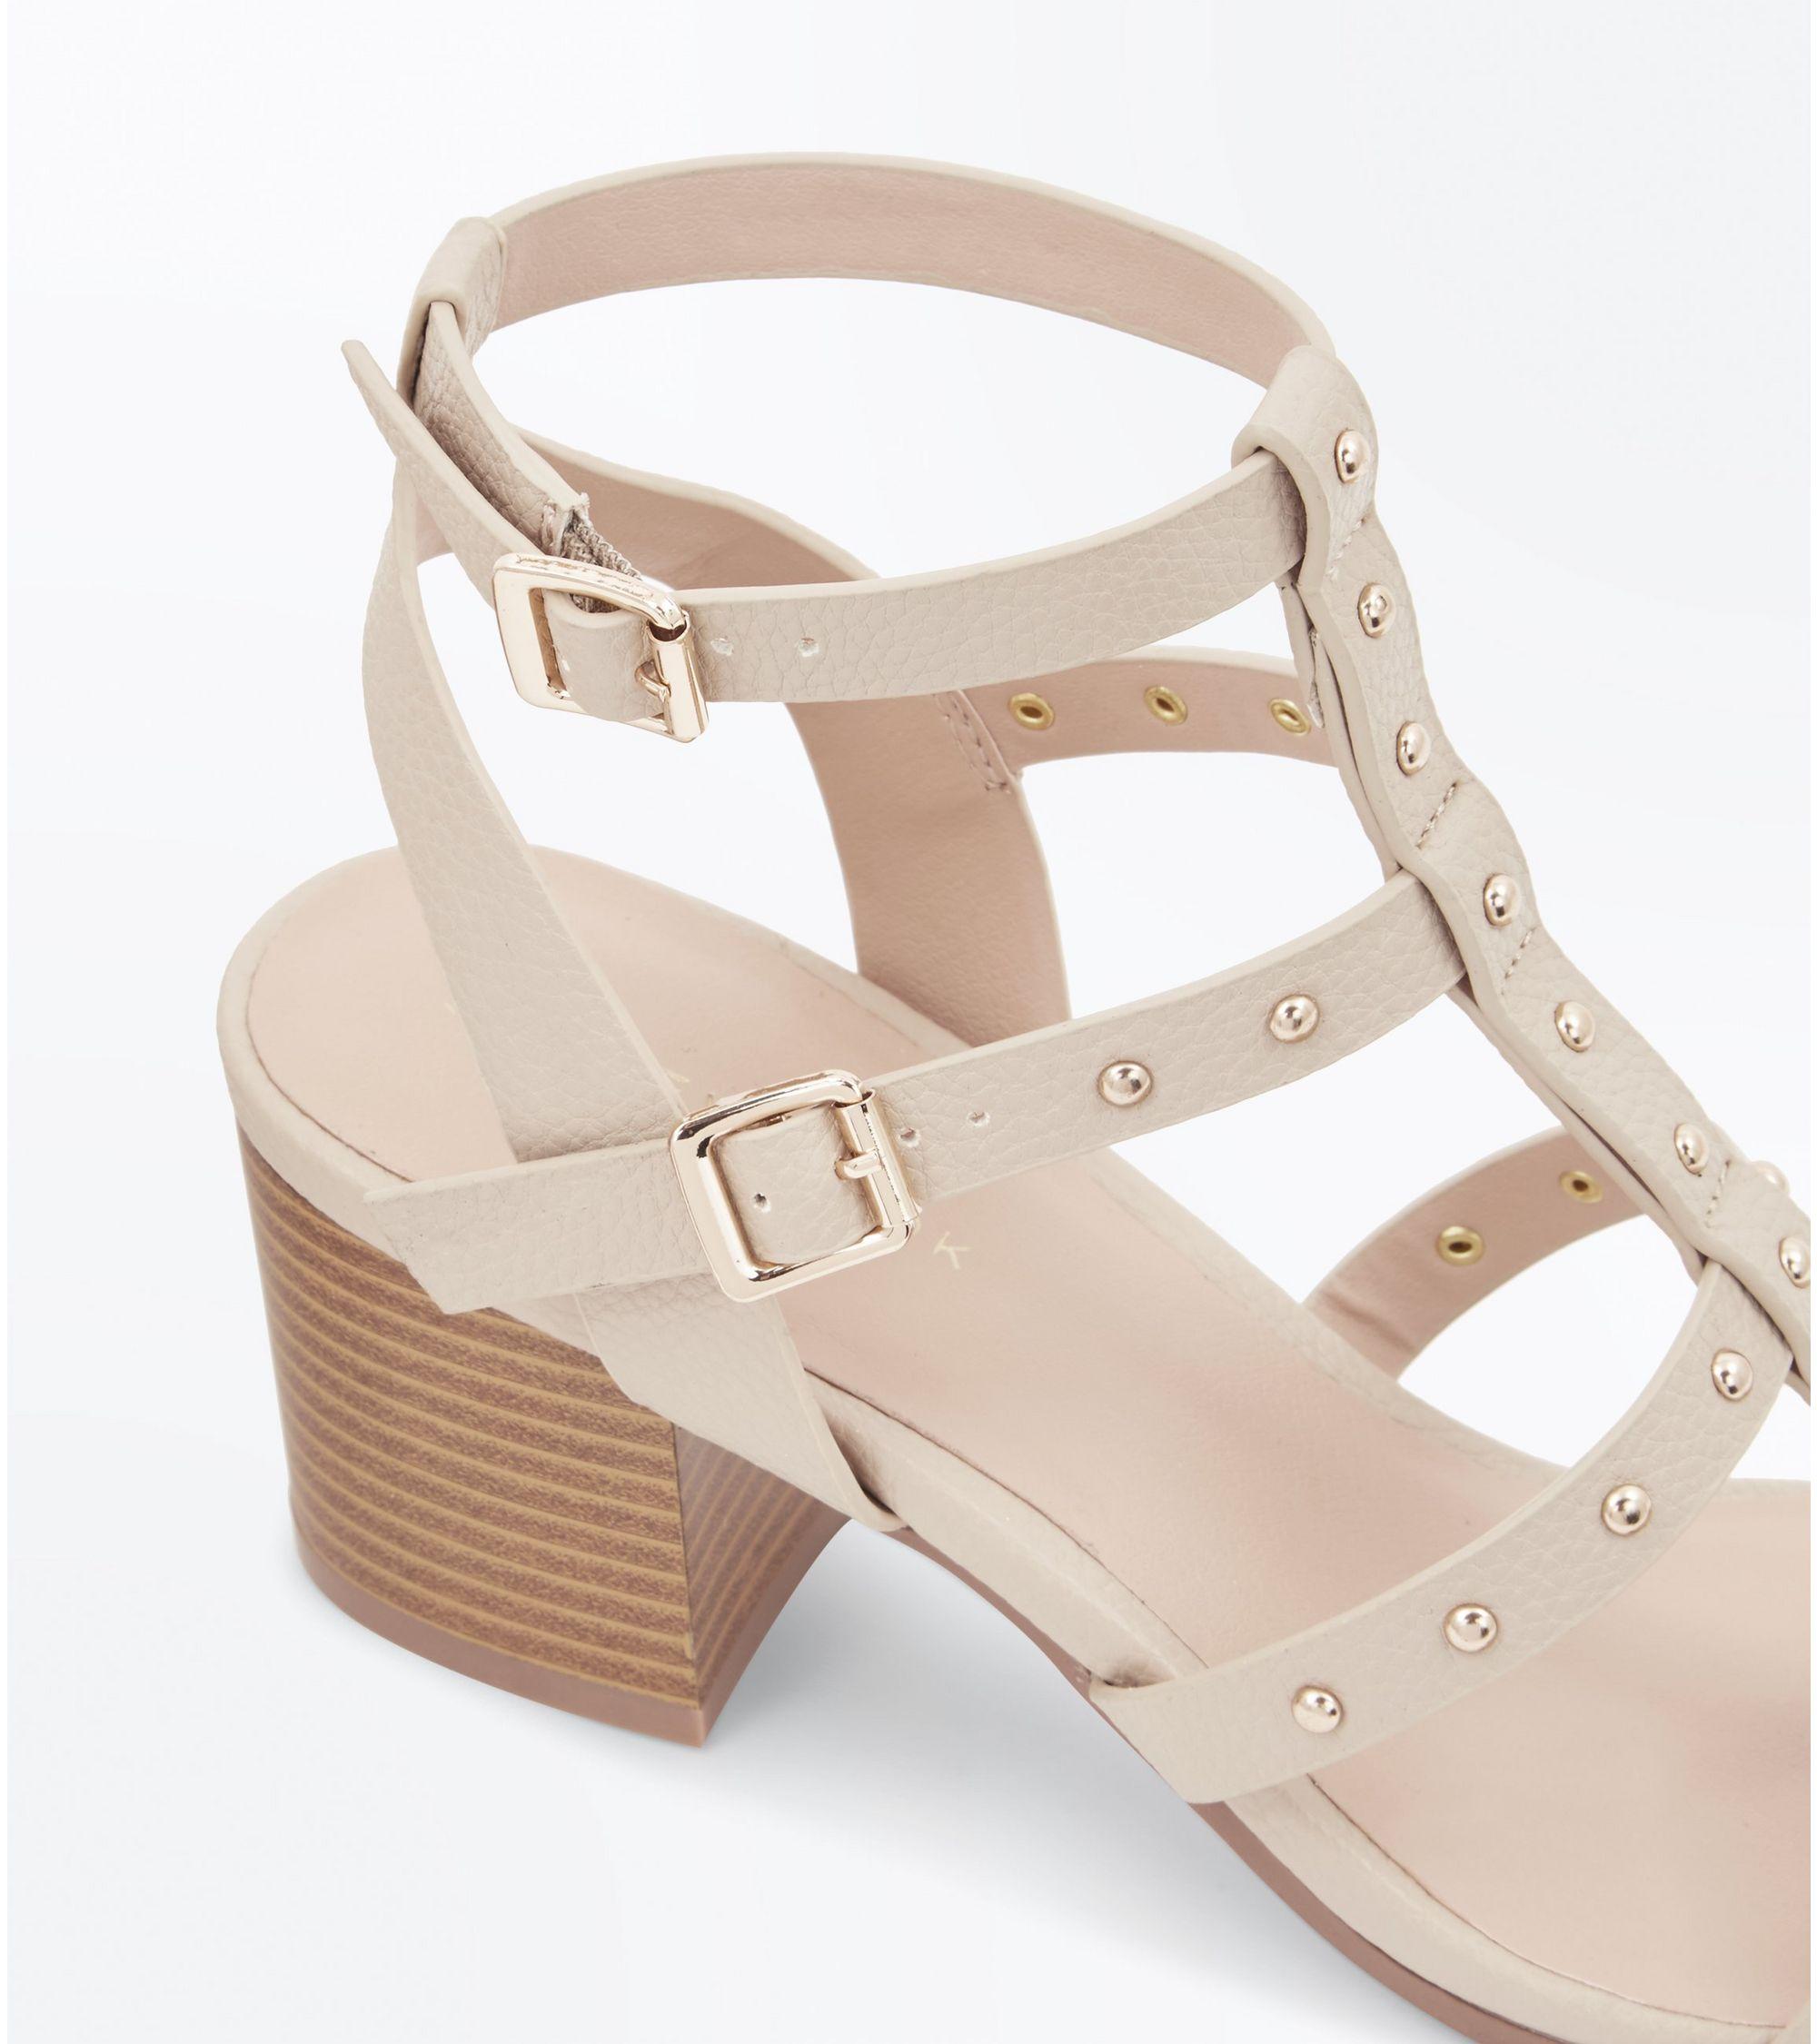 05f3c707ec44 New Look Brown Studded Block Heel Gladiator Sandals at £29.99